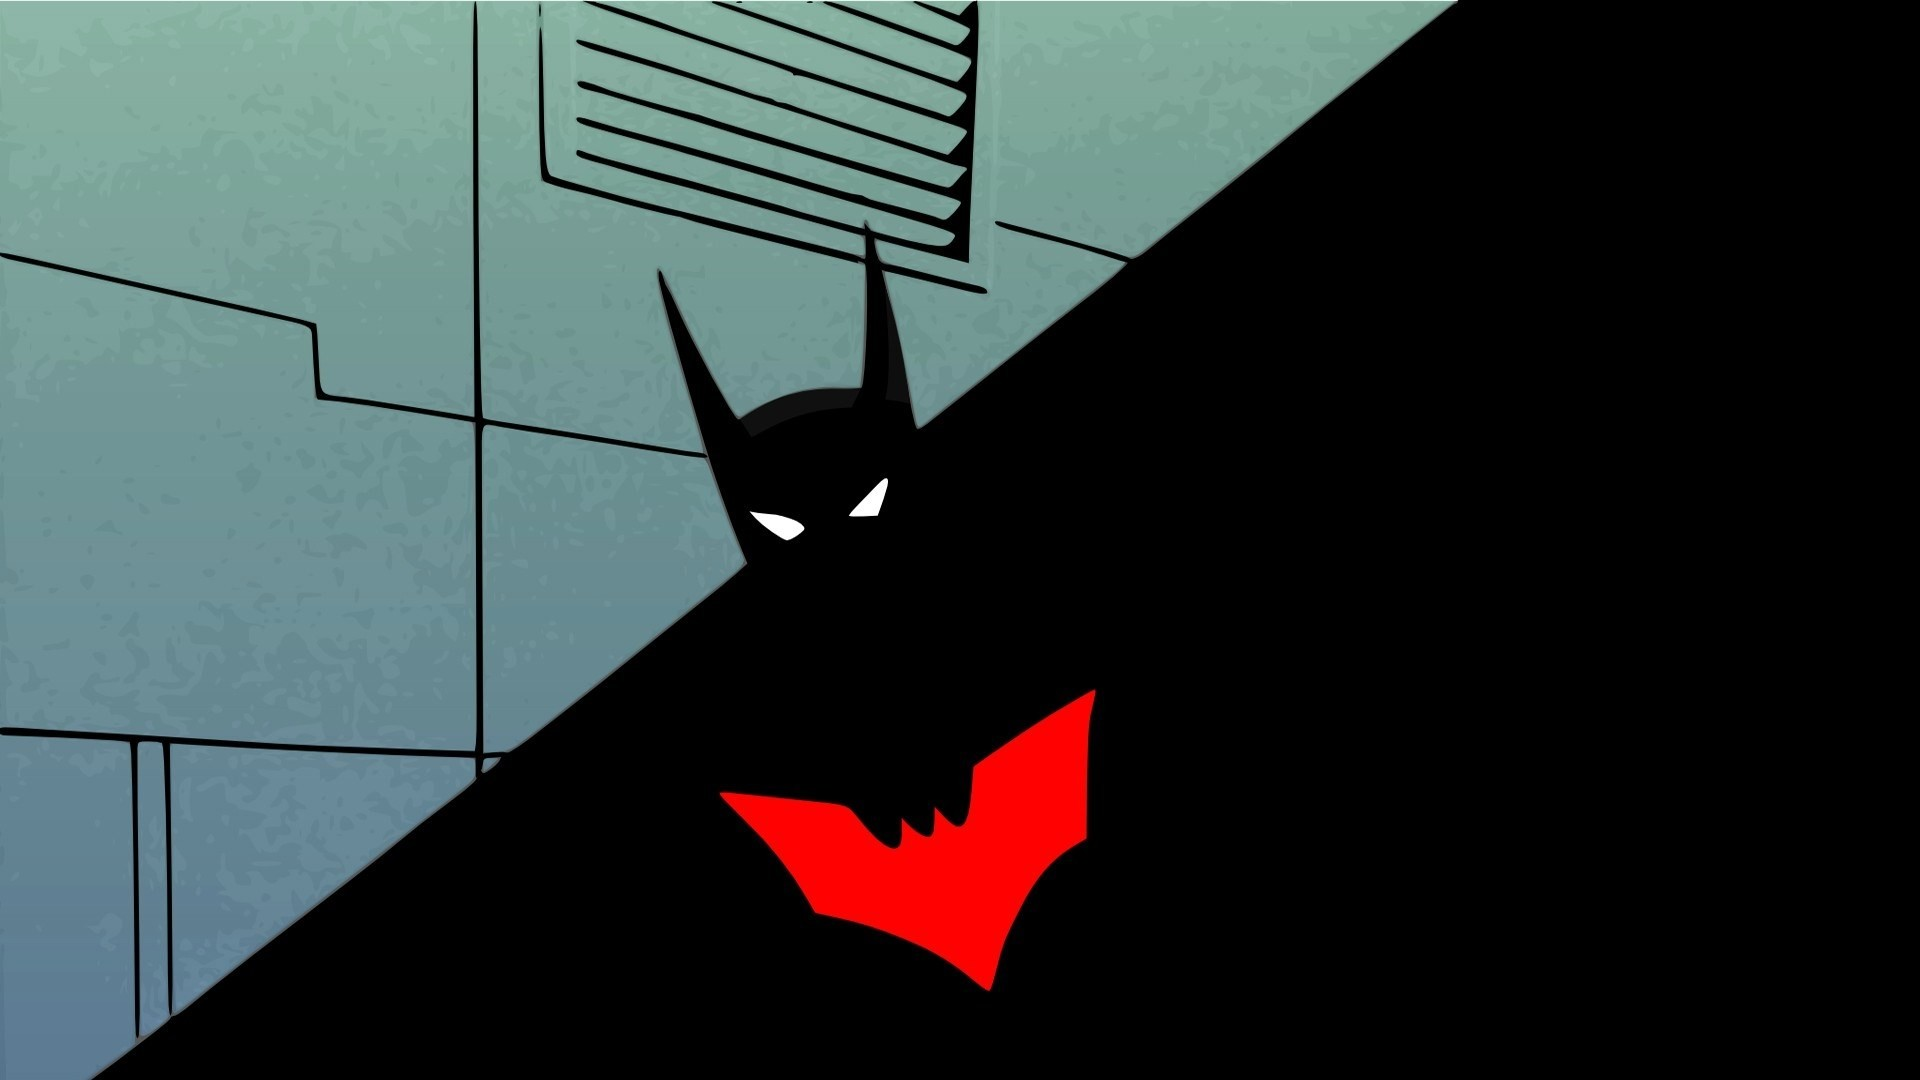 free wallpaper and screensavers for batman beyond – batman beyond category